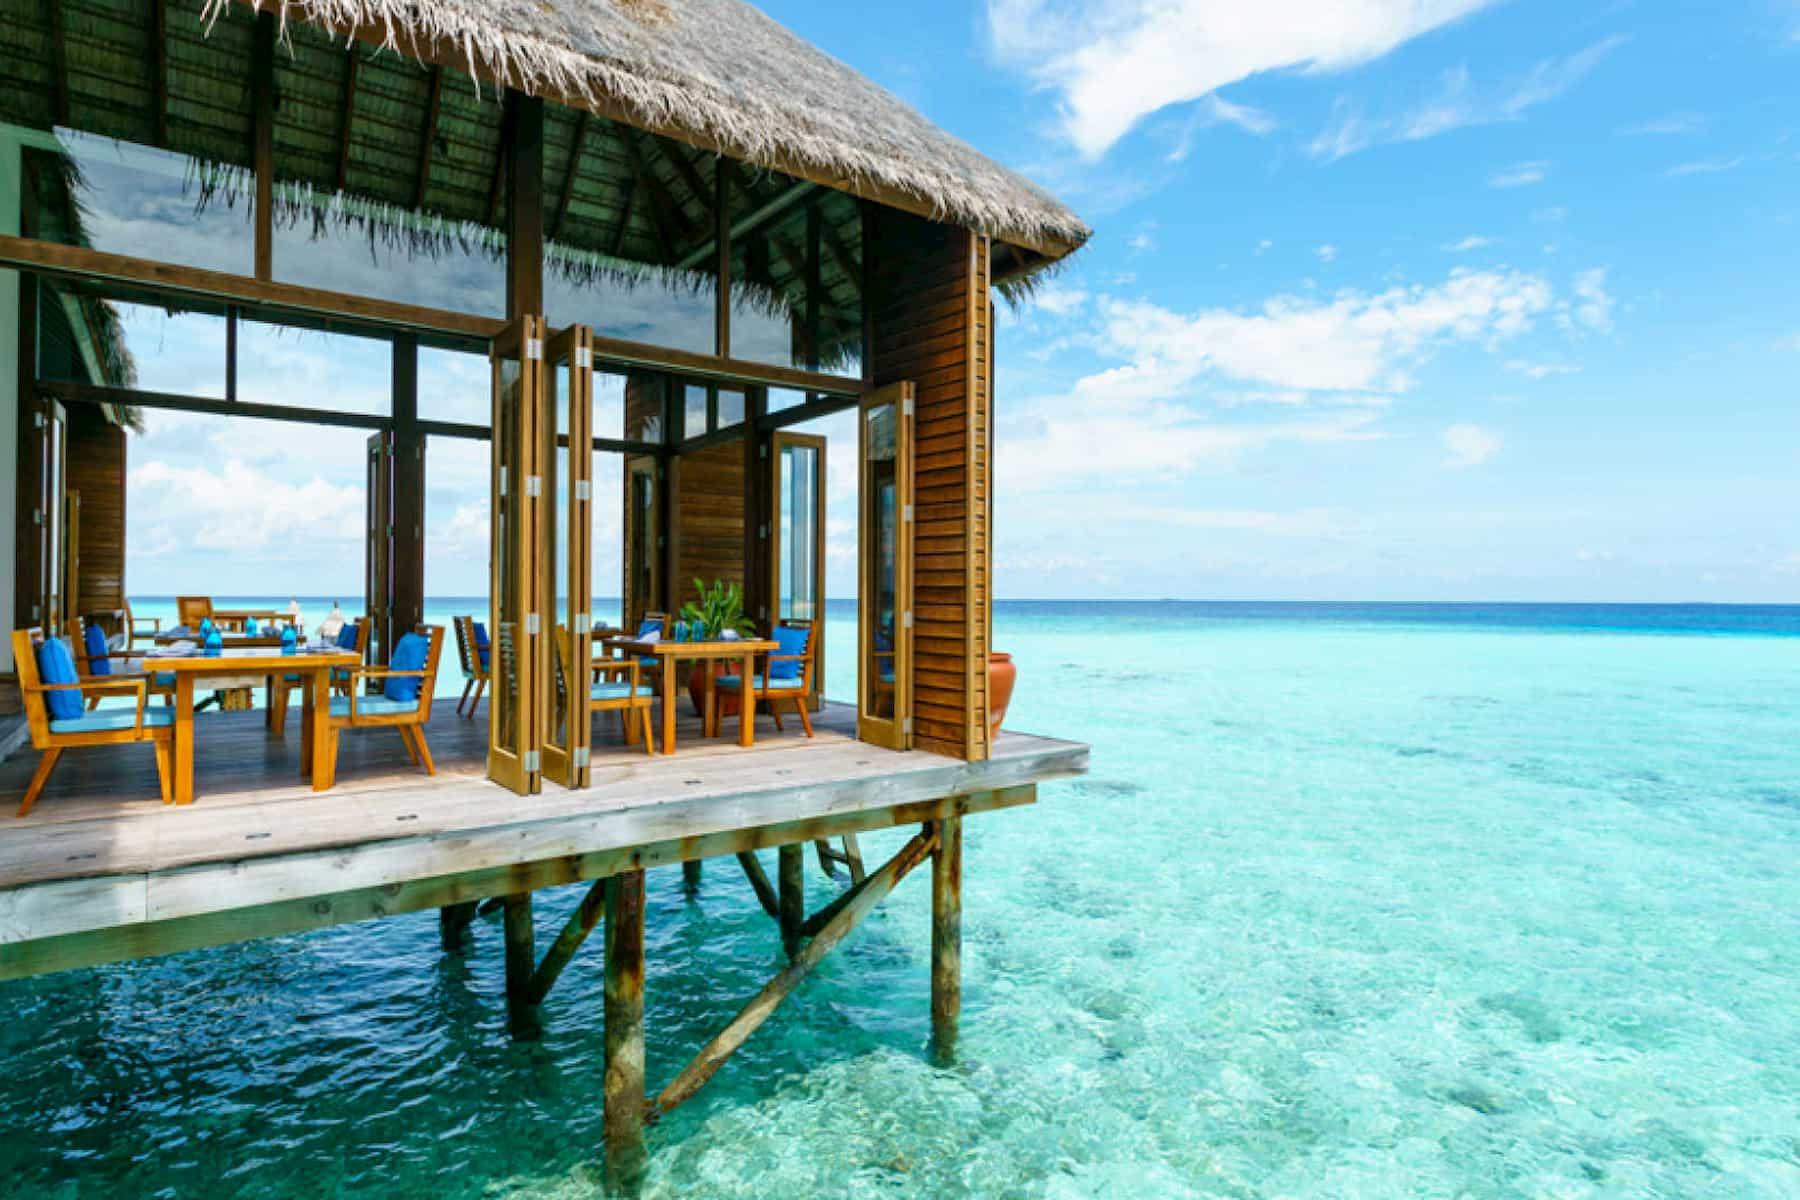 Resort Maldive Conrad Maldives Sunset ristorante Mandhoo Spa